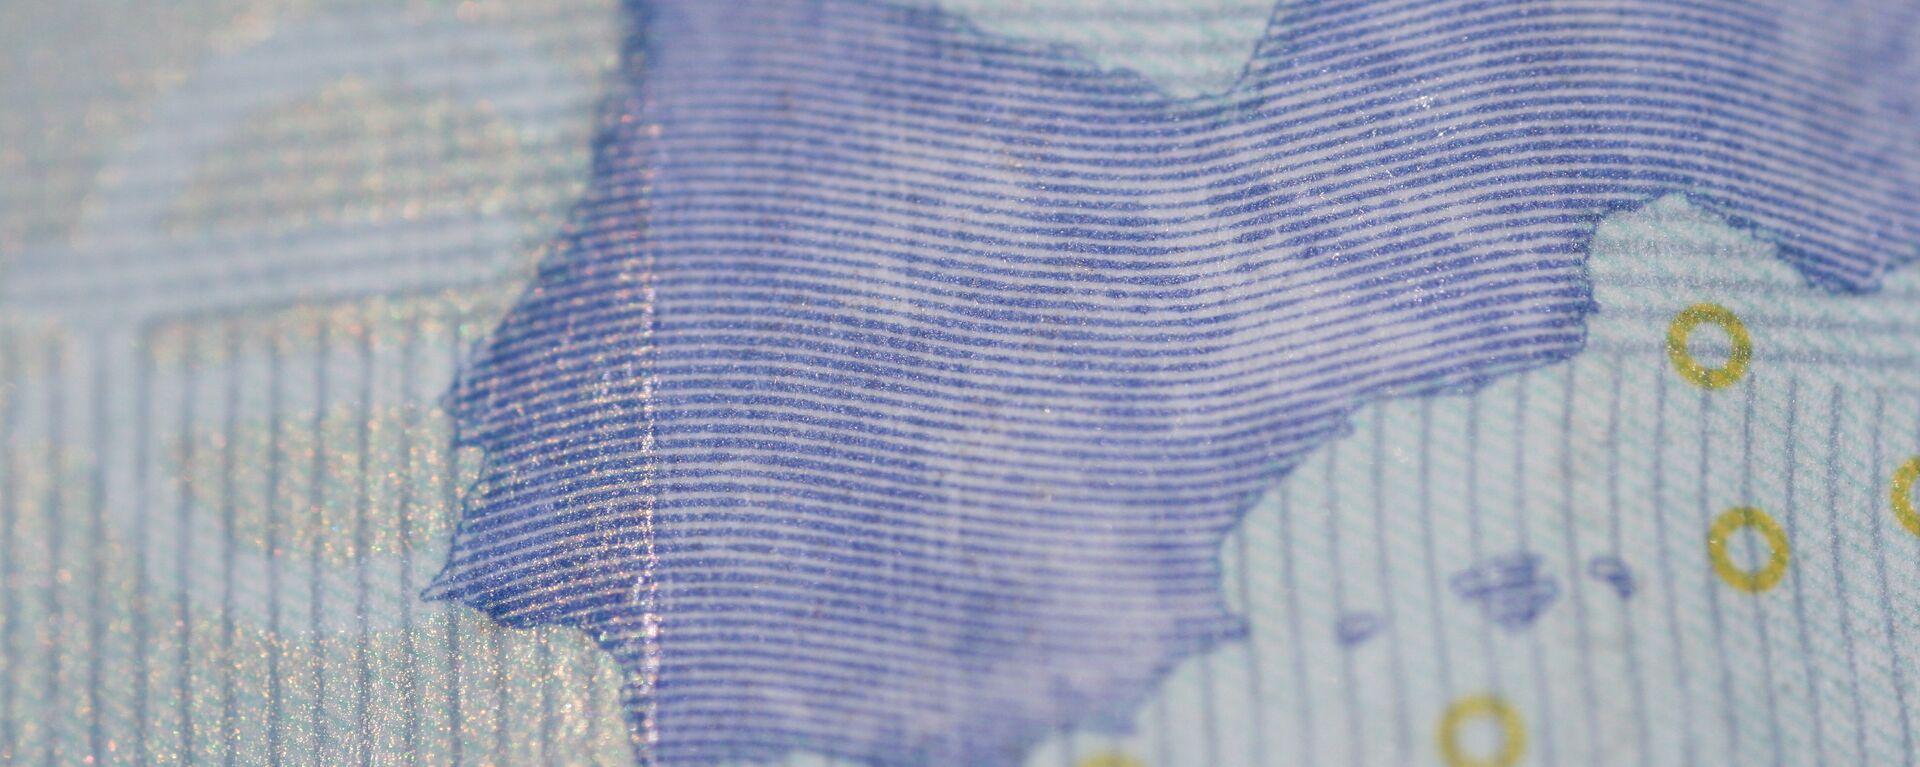 España en el billete de euro - Sputnik Mundo, 1920, 14.08.2021